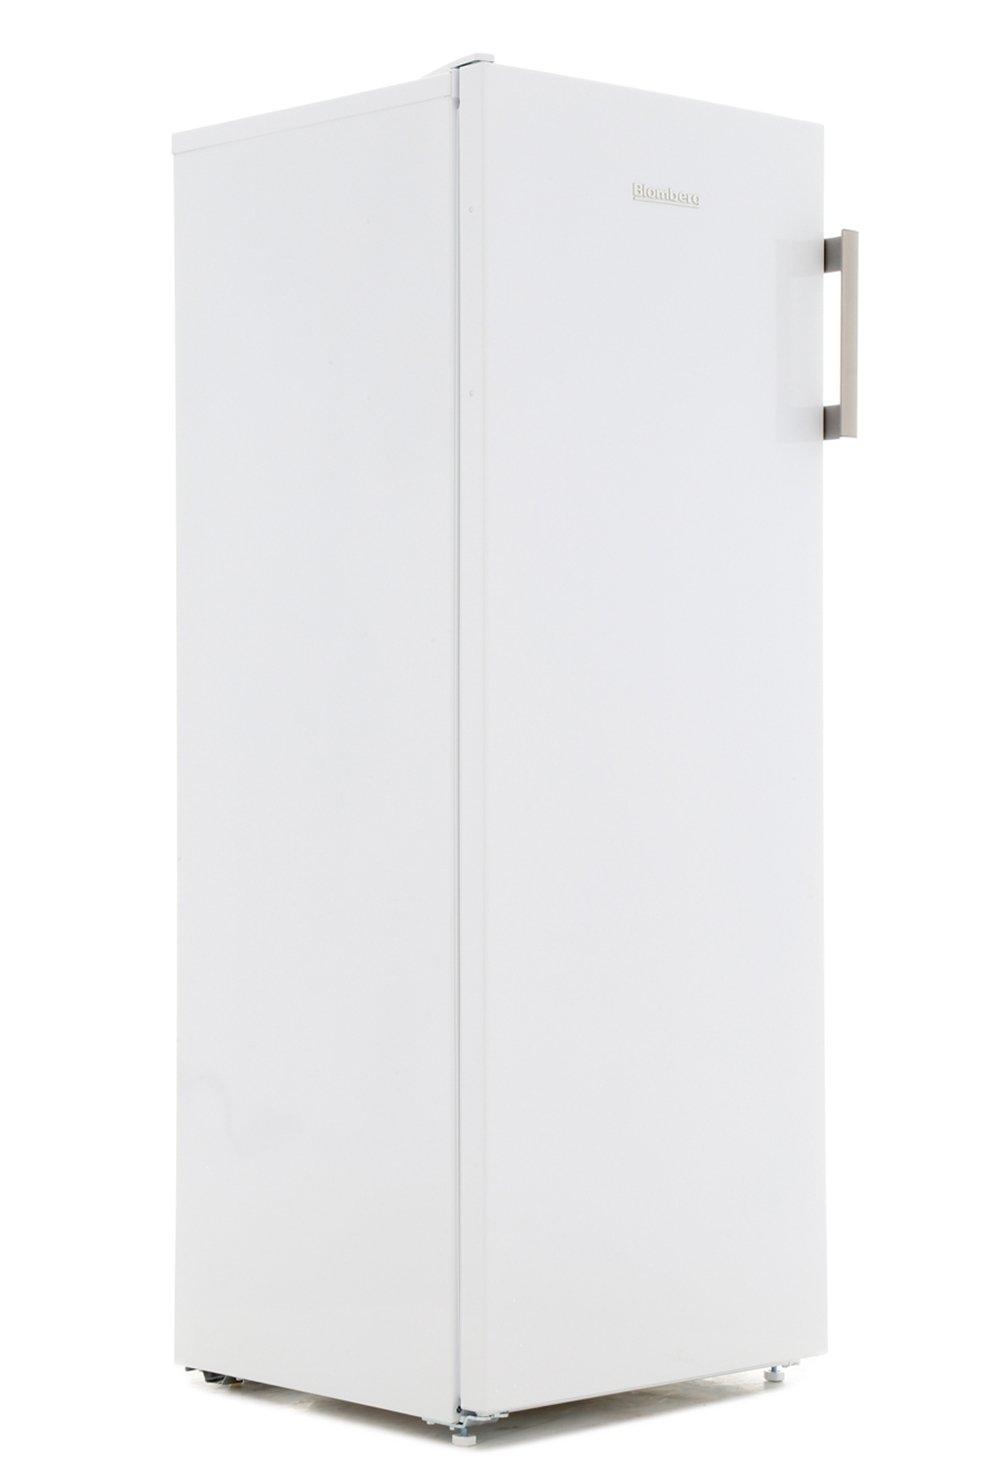 Blomberg FNT4550 Frost Free Tall Freezer